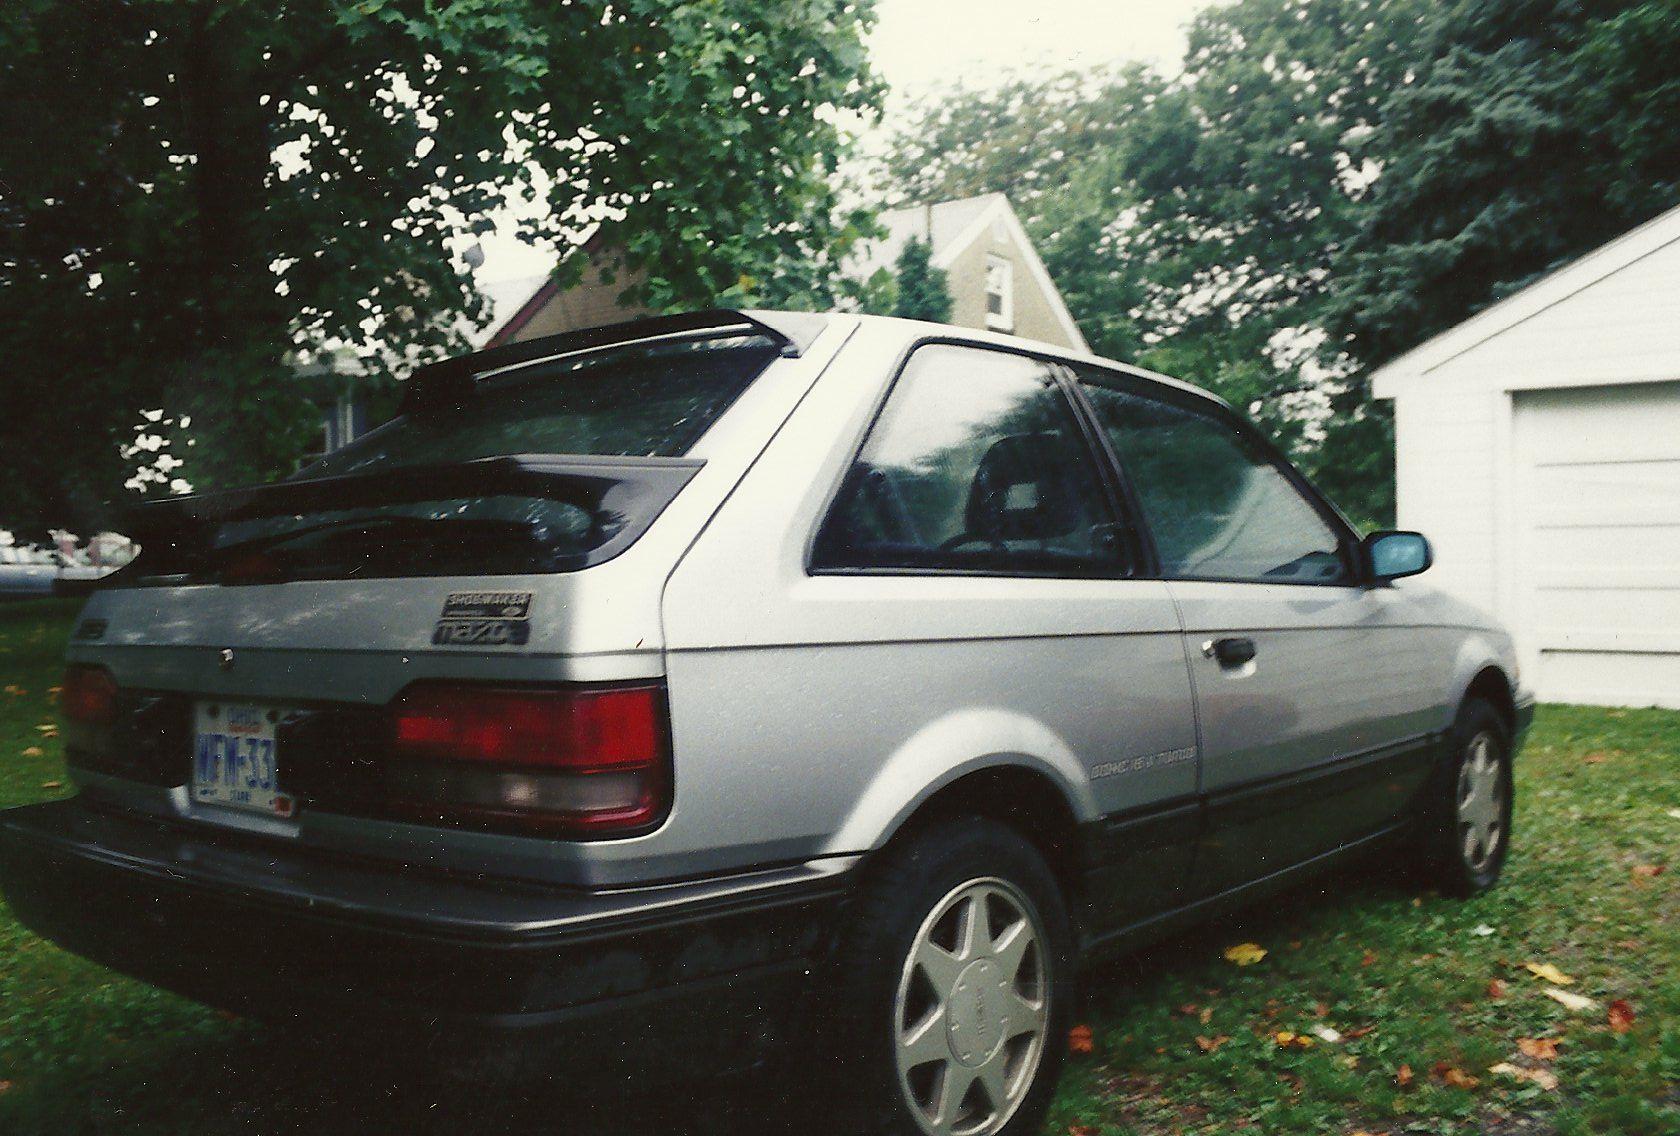 my first 1988 mazda 323 gtx 1 6l turbo all wheel drive 5 speed rh pinterest com Manual Mazda 325 Mazda 3 Manual